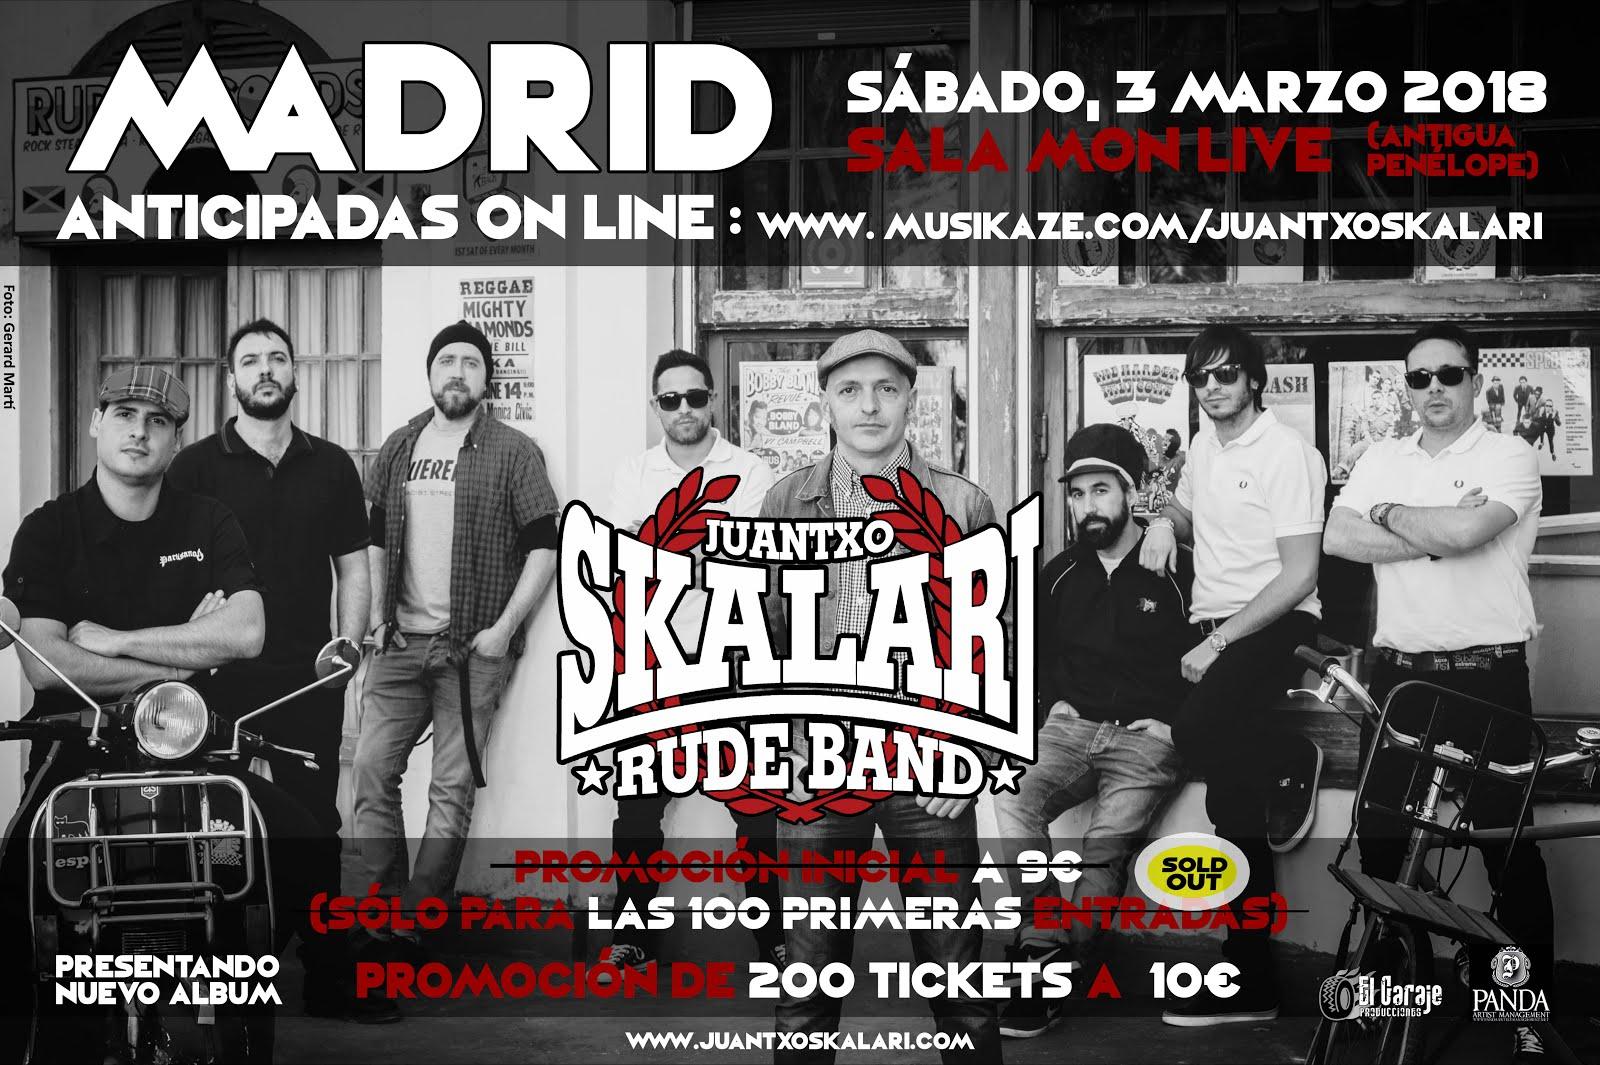 MADRID - SALA MON LIVE   03/03/2018